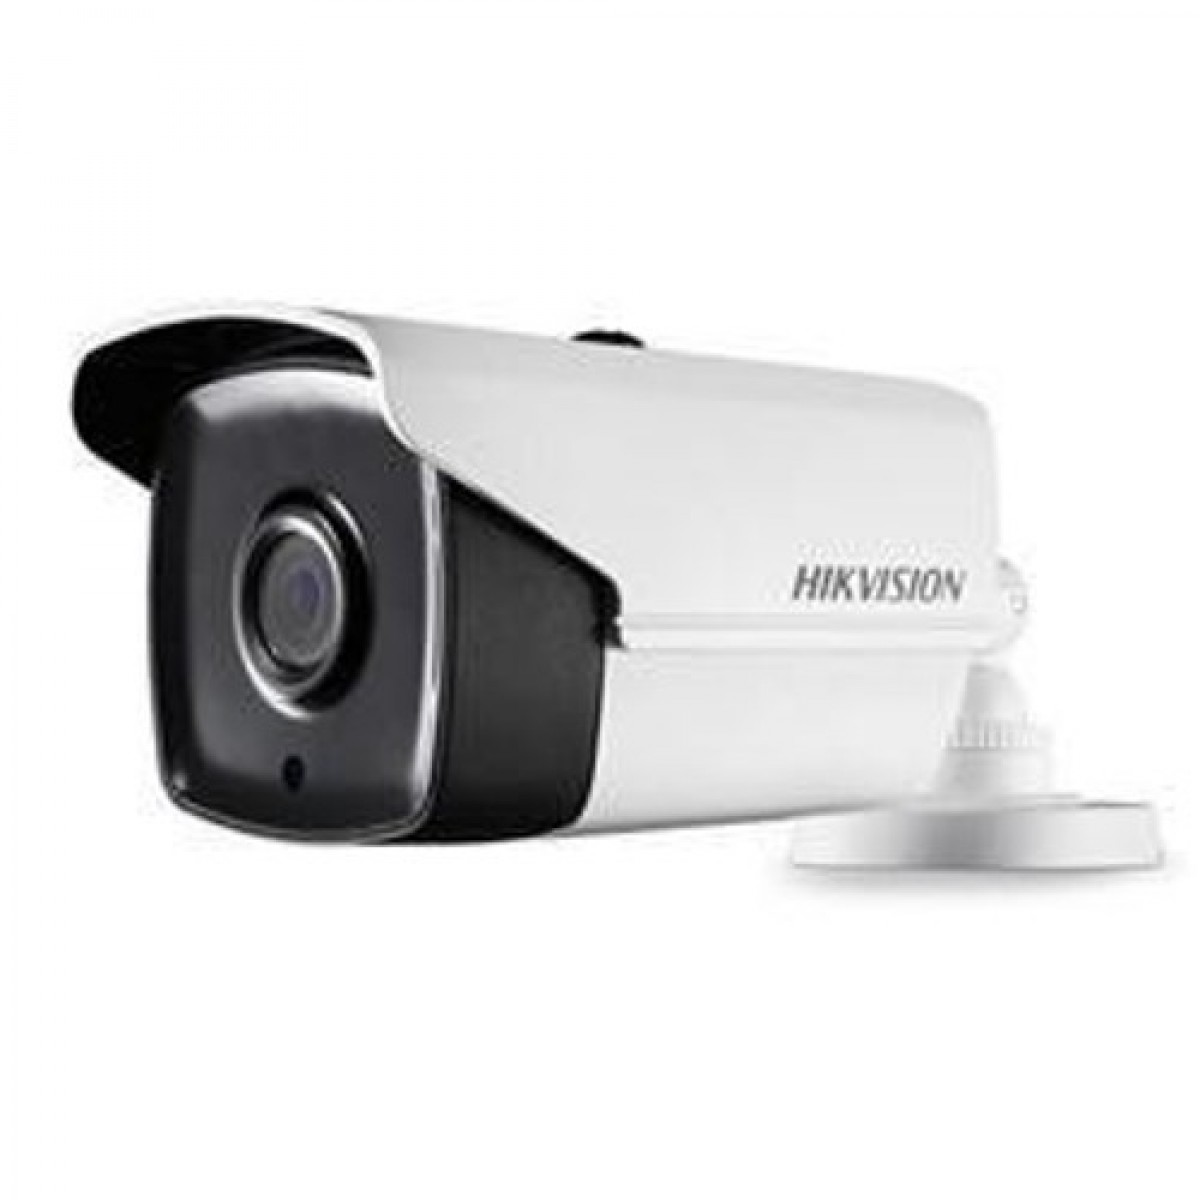 hikvision cctv camera price list in bangladesh Archives – TRIMATRIK